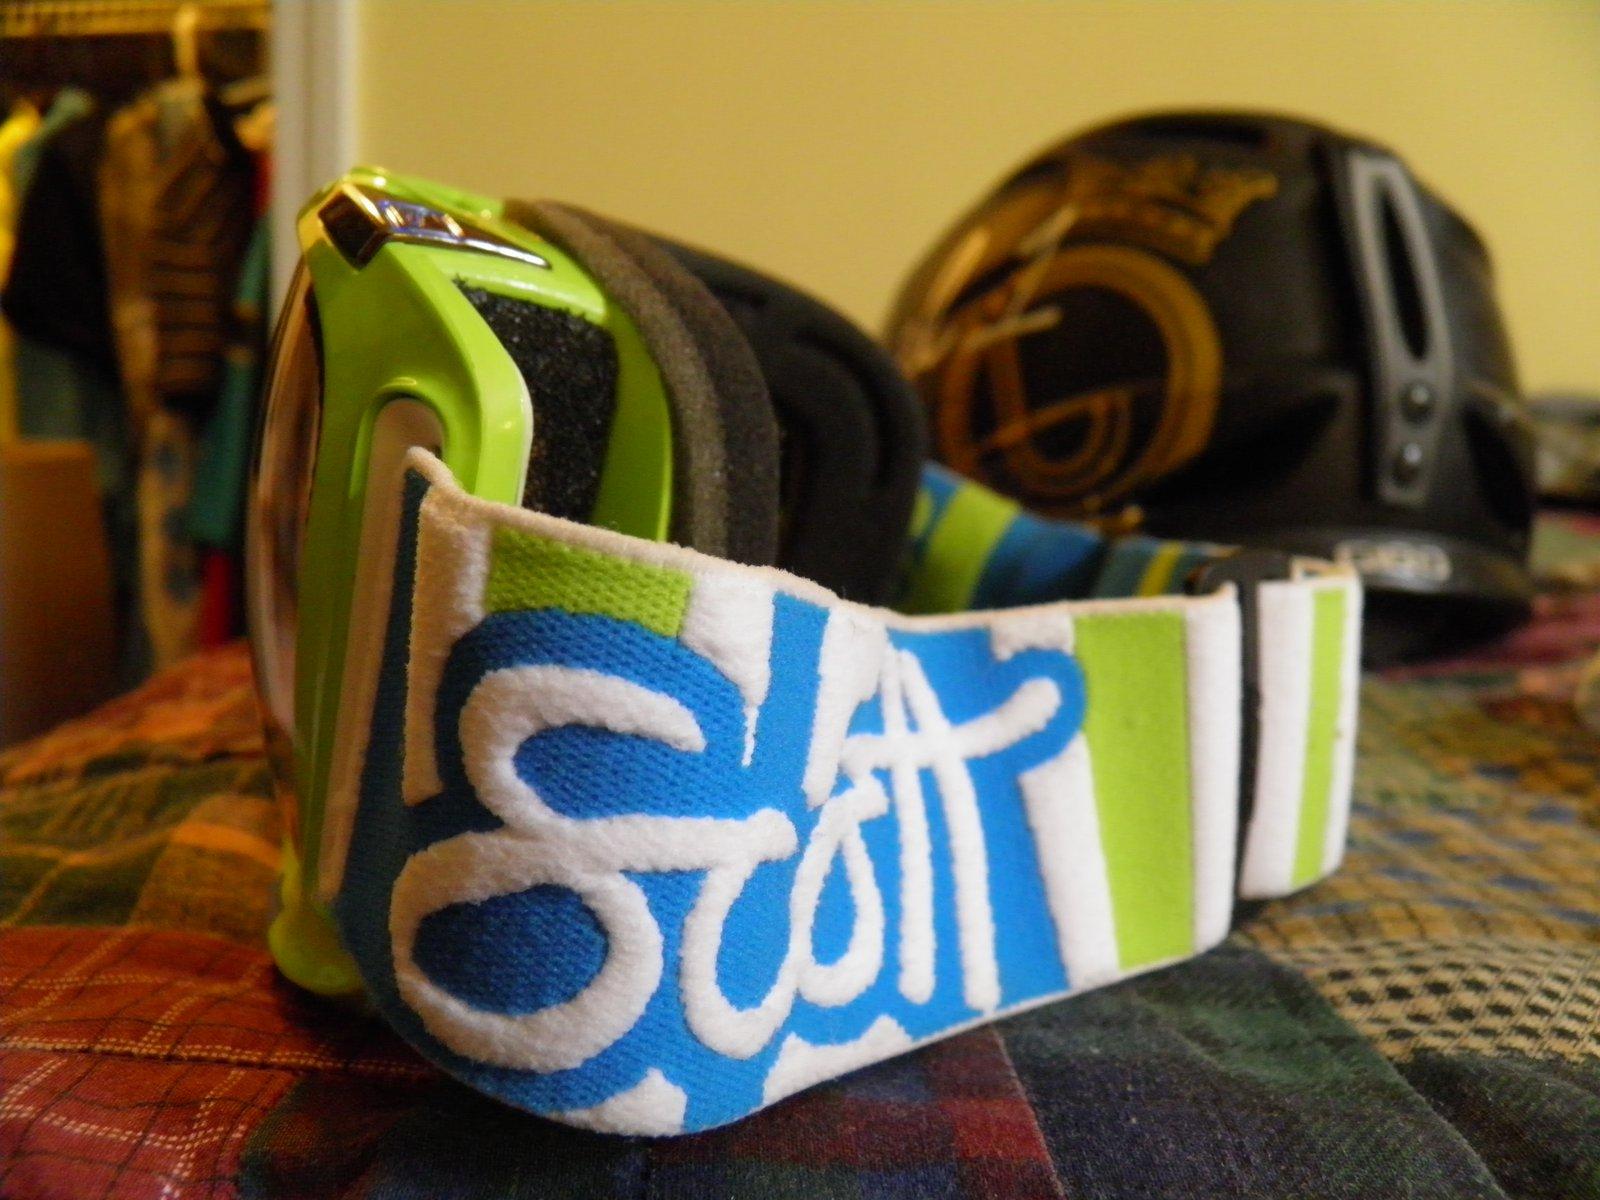 Scott Fixes 1